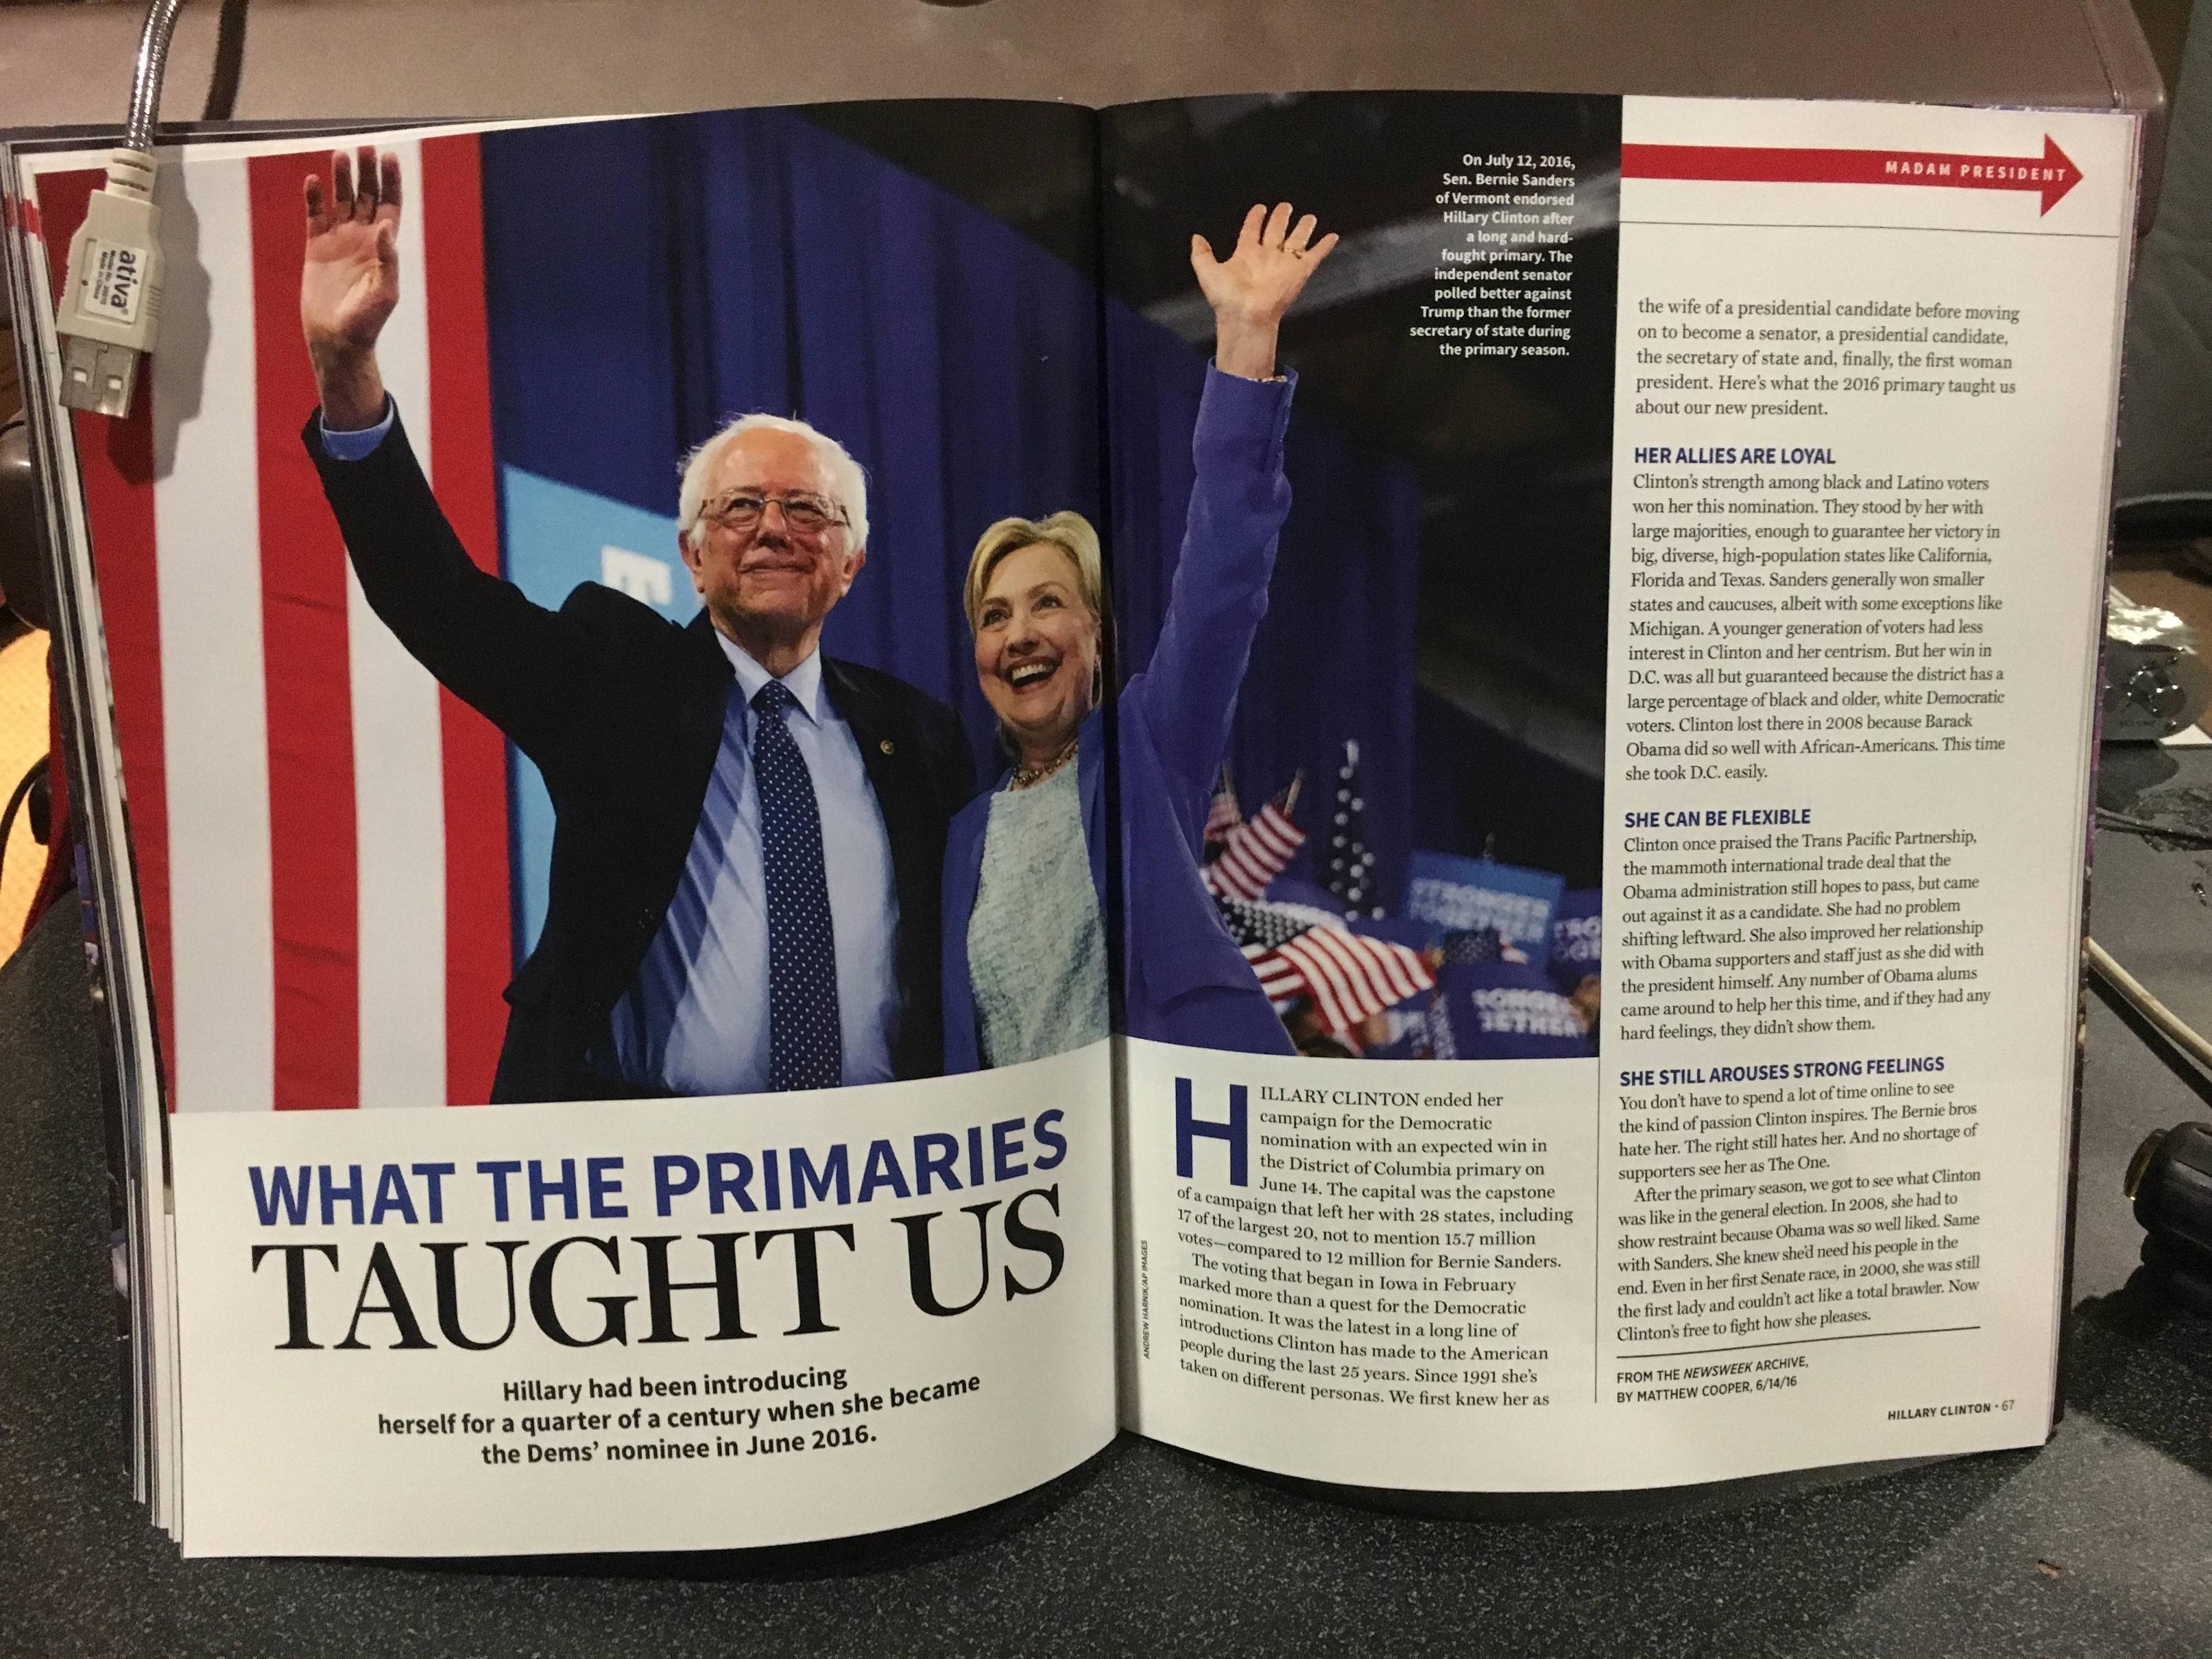 newsweek-madame-hillary-clinton-page-34